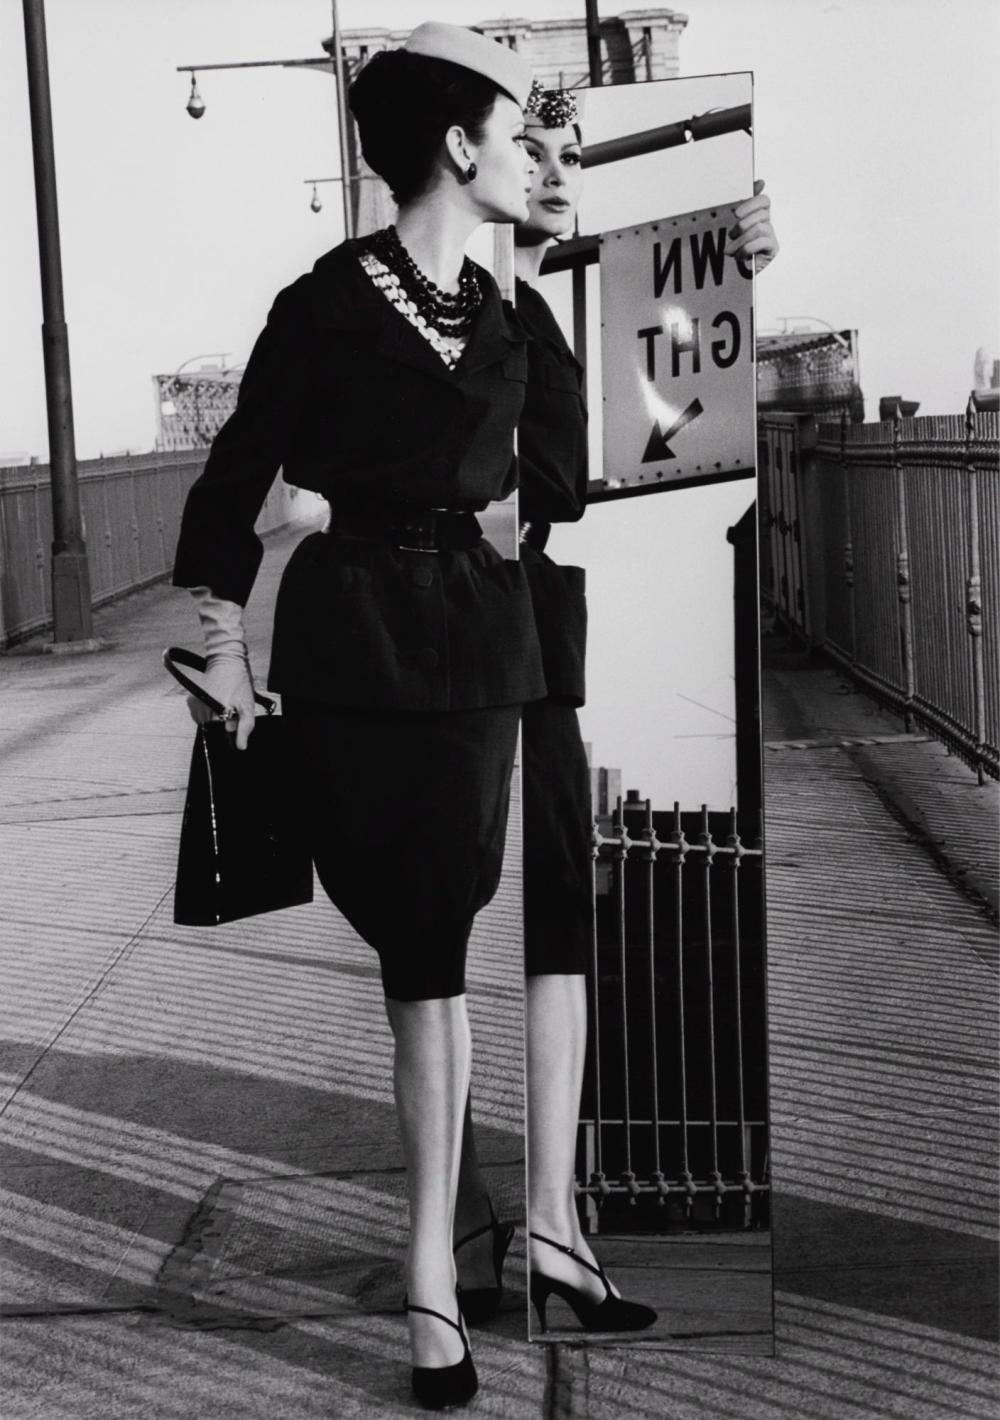 WILLIAM KLEIN | Annalise on Brooklyn Bridge & Mirror, N.Y., Vogue, 1963